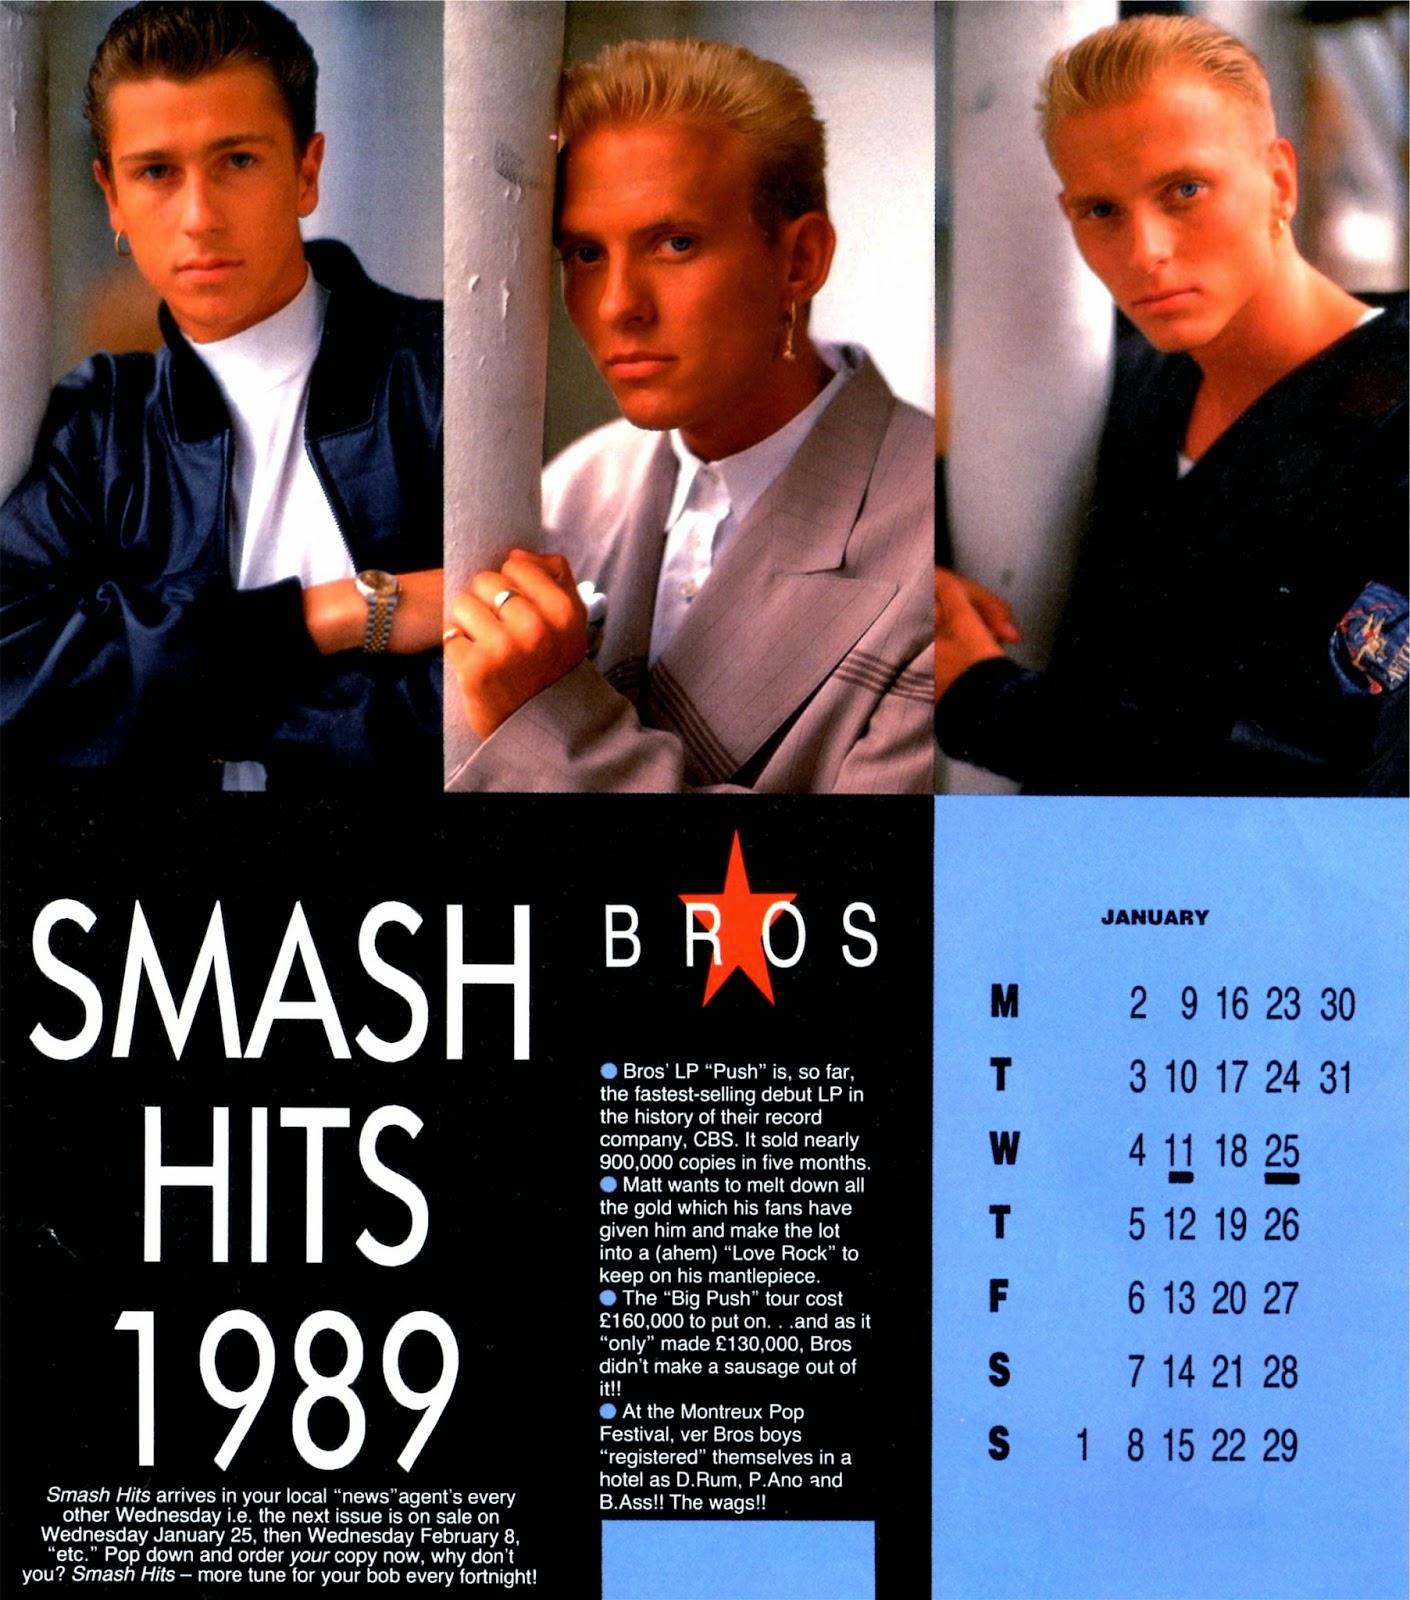 List of songs in Smash